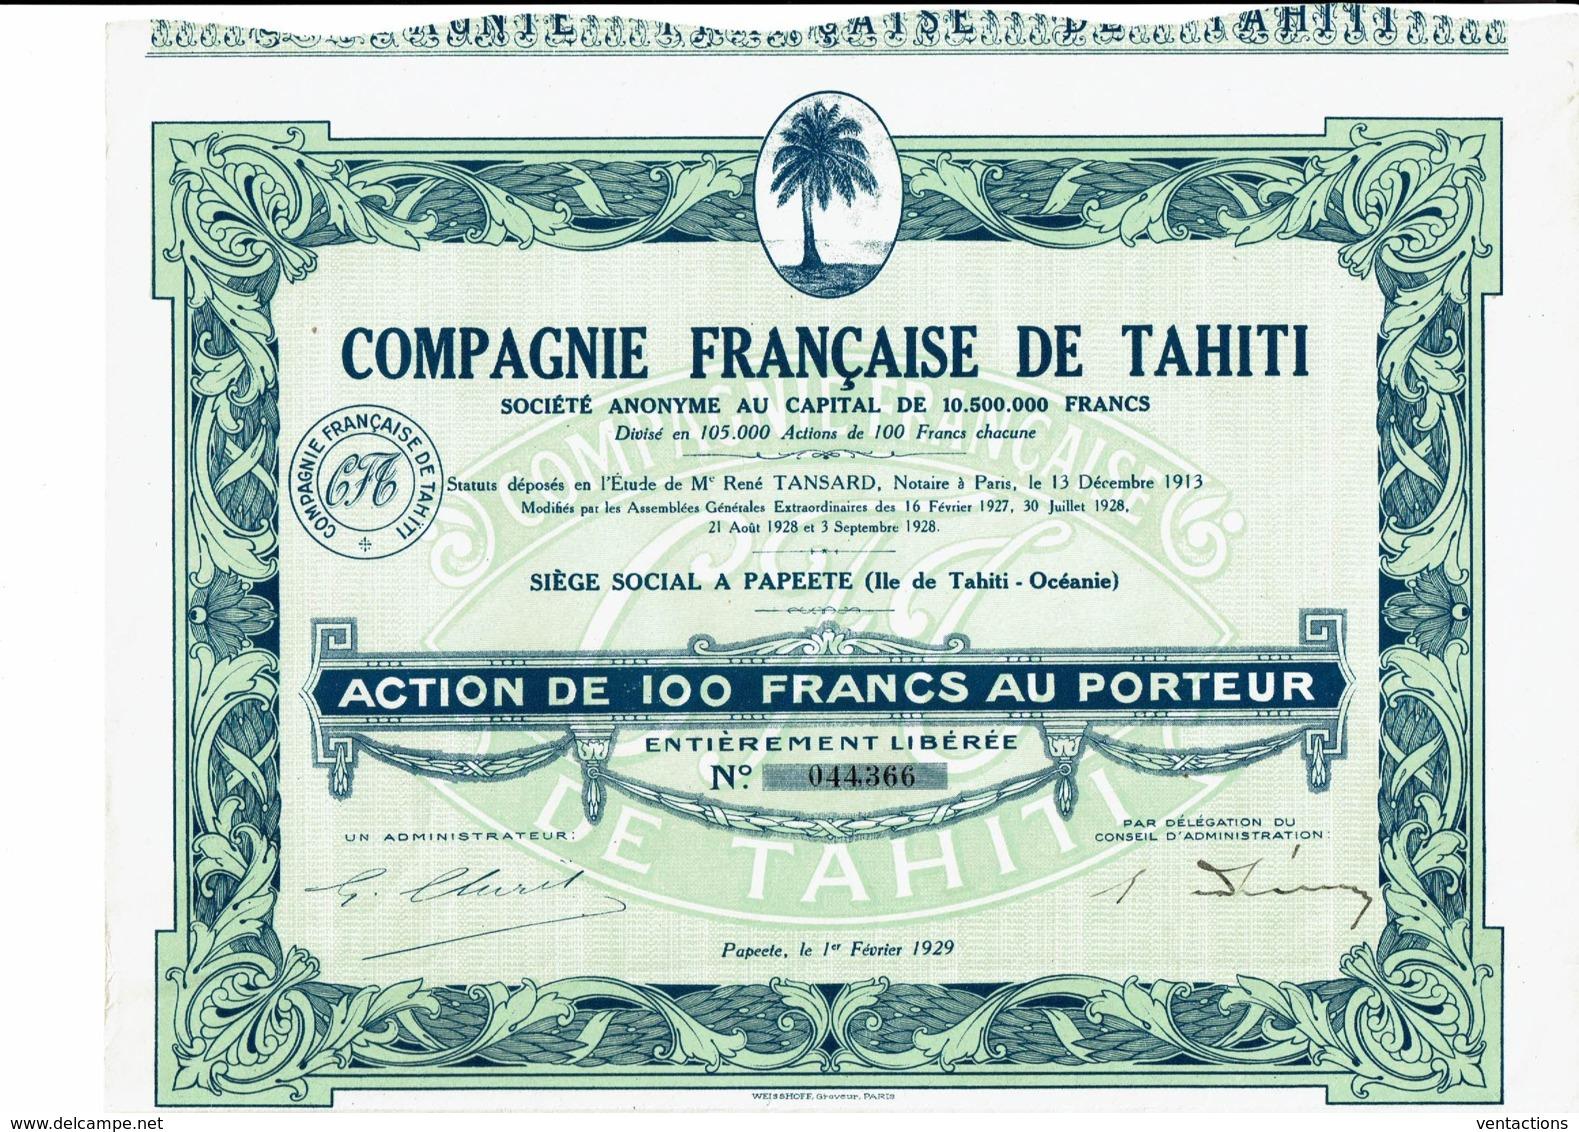 TAHITI-FRANCAISE DE TAHITI. CIE ... PAPEETE. Action 1929 - Shareholdings